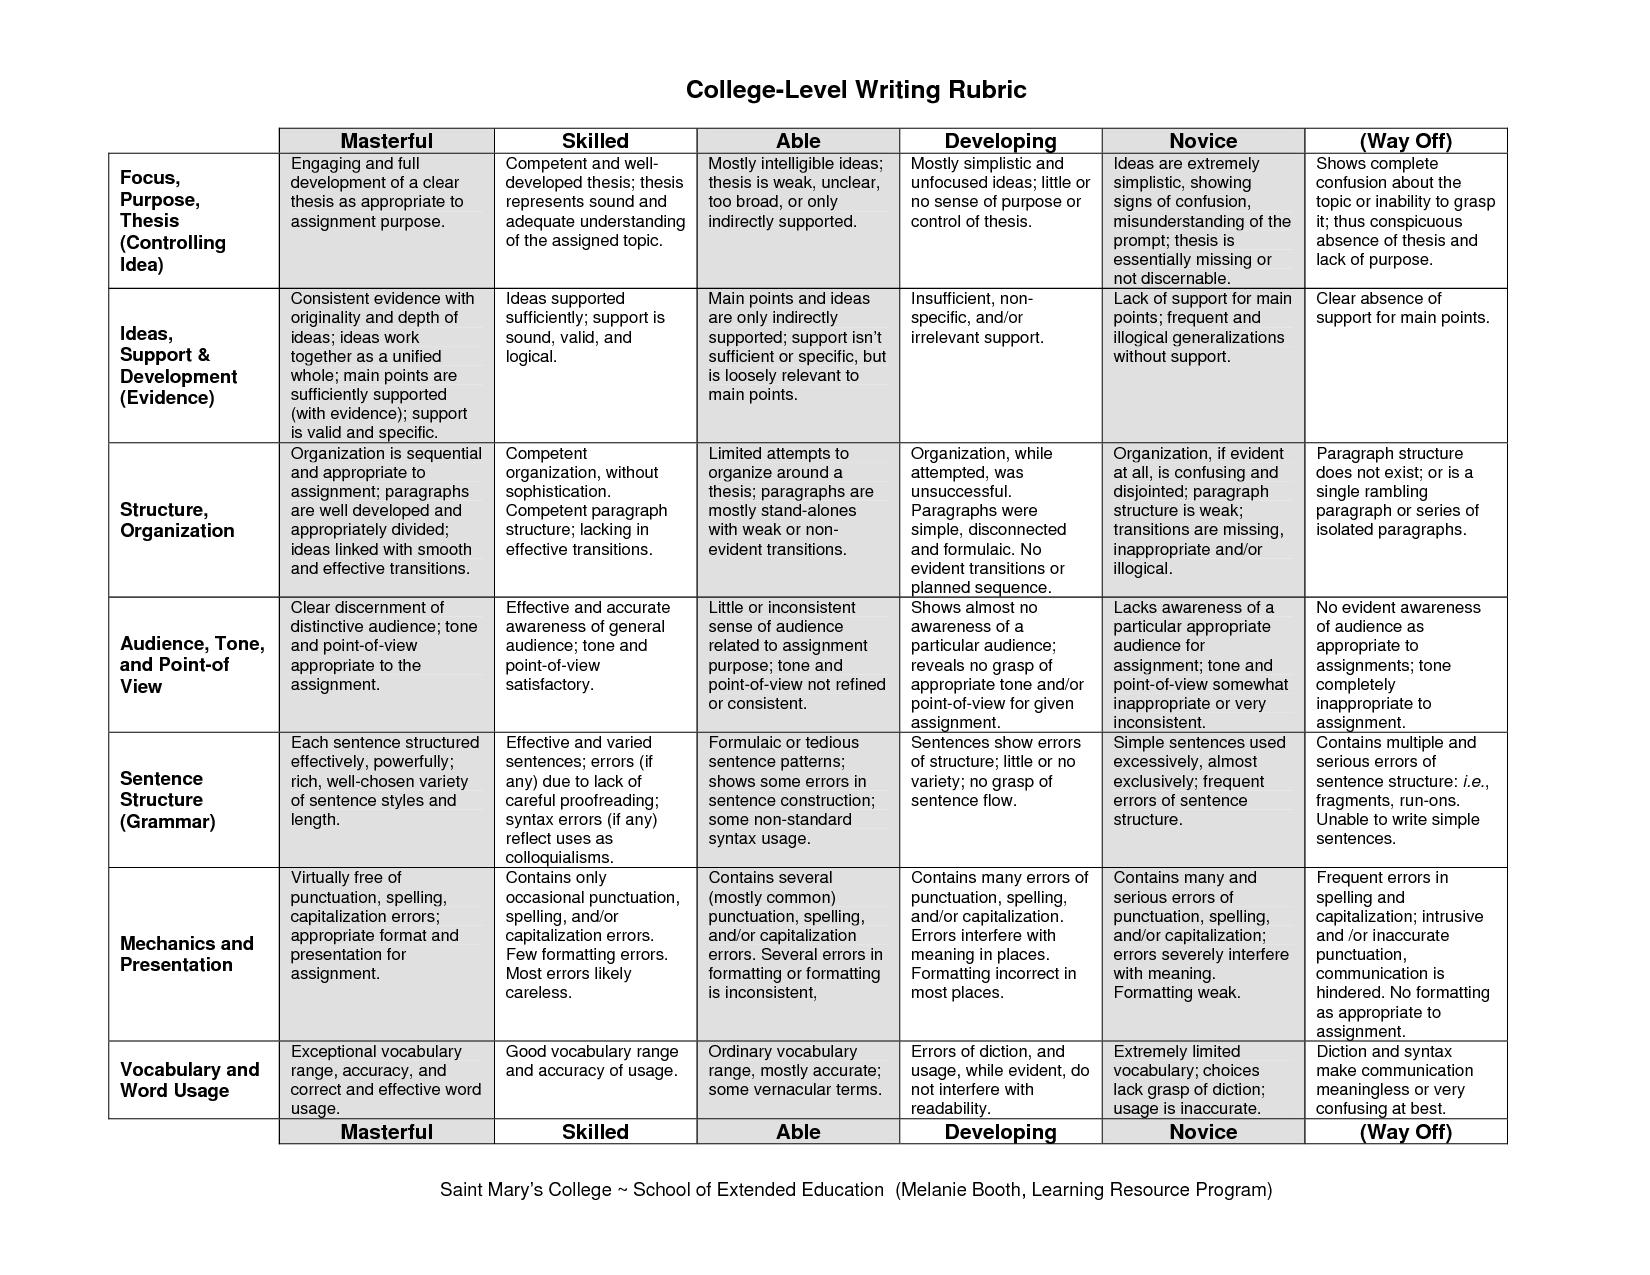 002 Essay Rubric College Wonderful Board Narrative Writing Persuasive Full